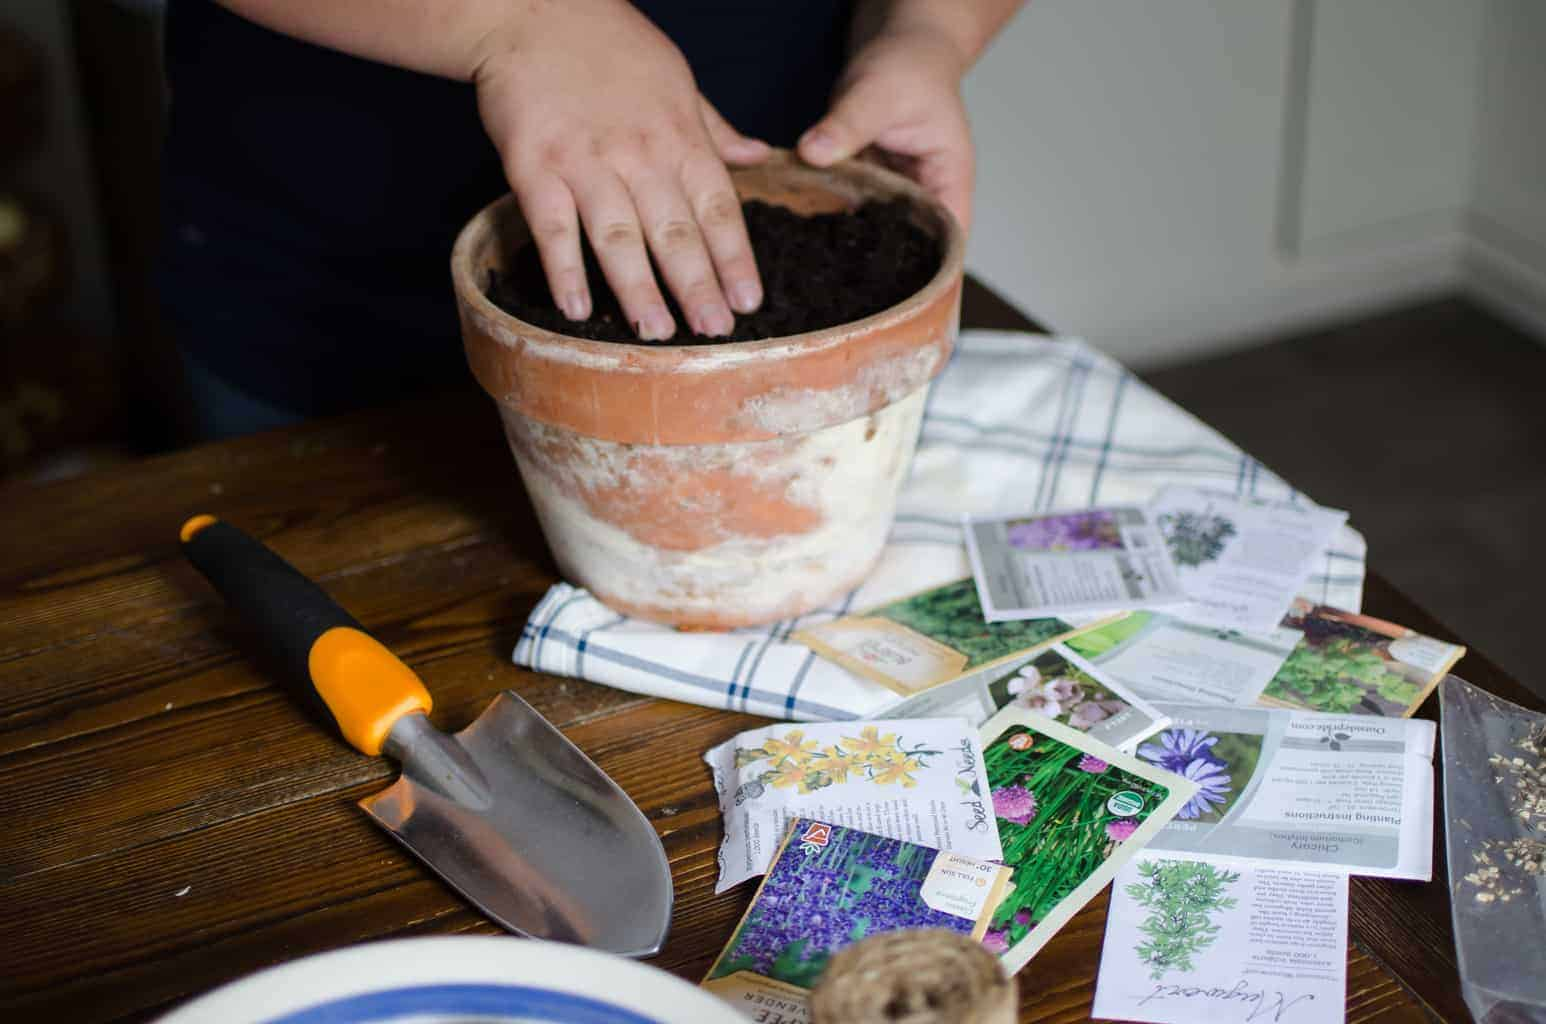 Staring Herb Seeds + Homemade Potting Soil Recipe